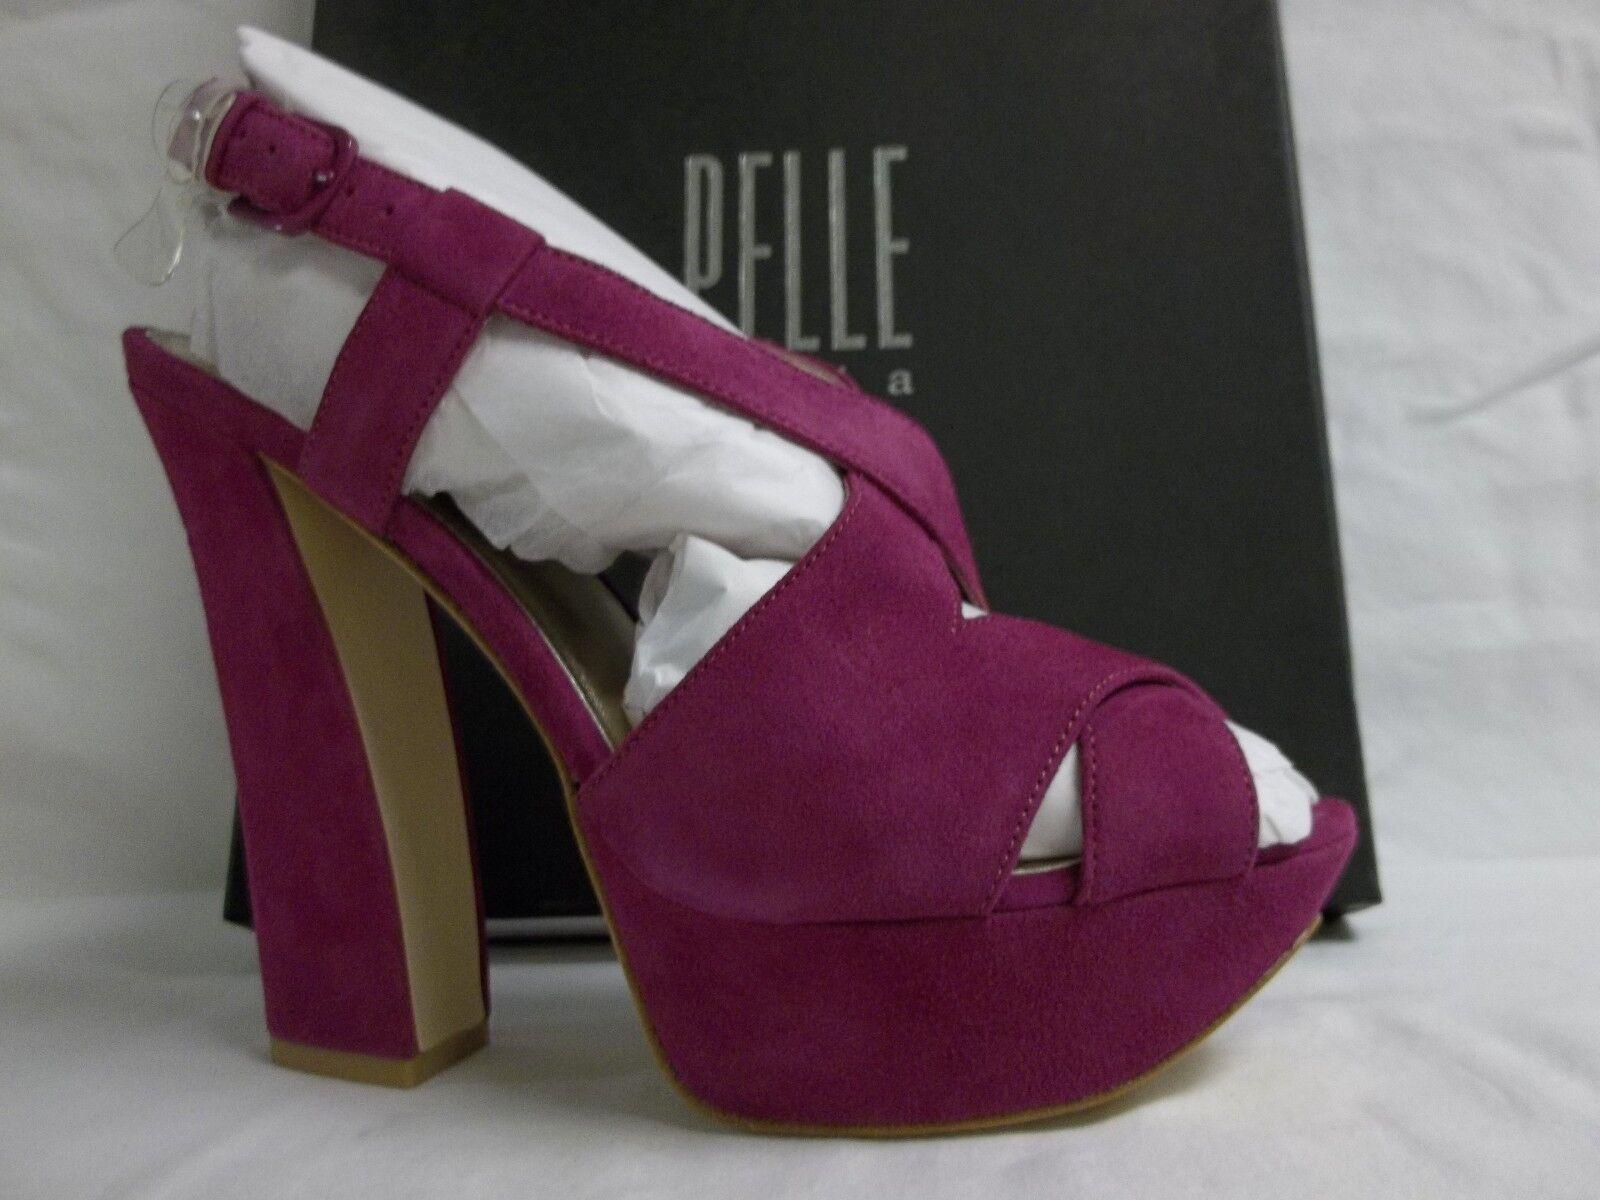 Pelle Moda Größe 8 M Billow Cerise Suede Open Toe Heels NEU Damenschuhe Schuhes